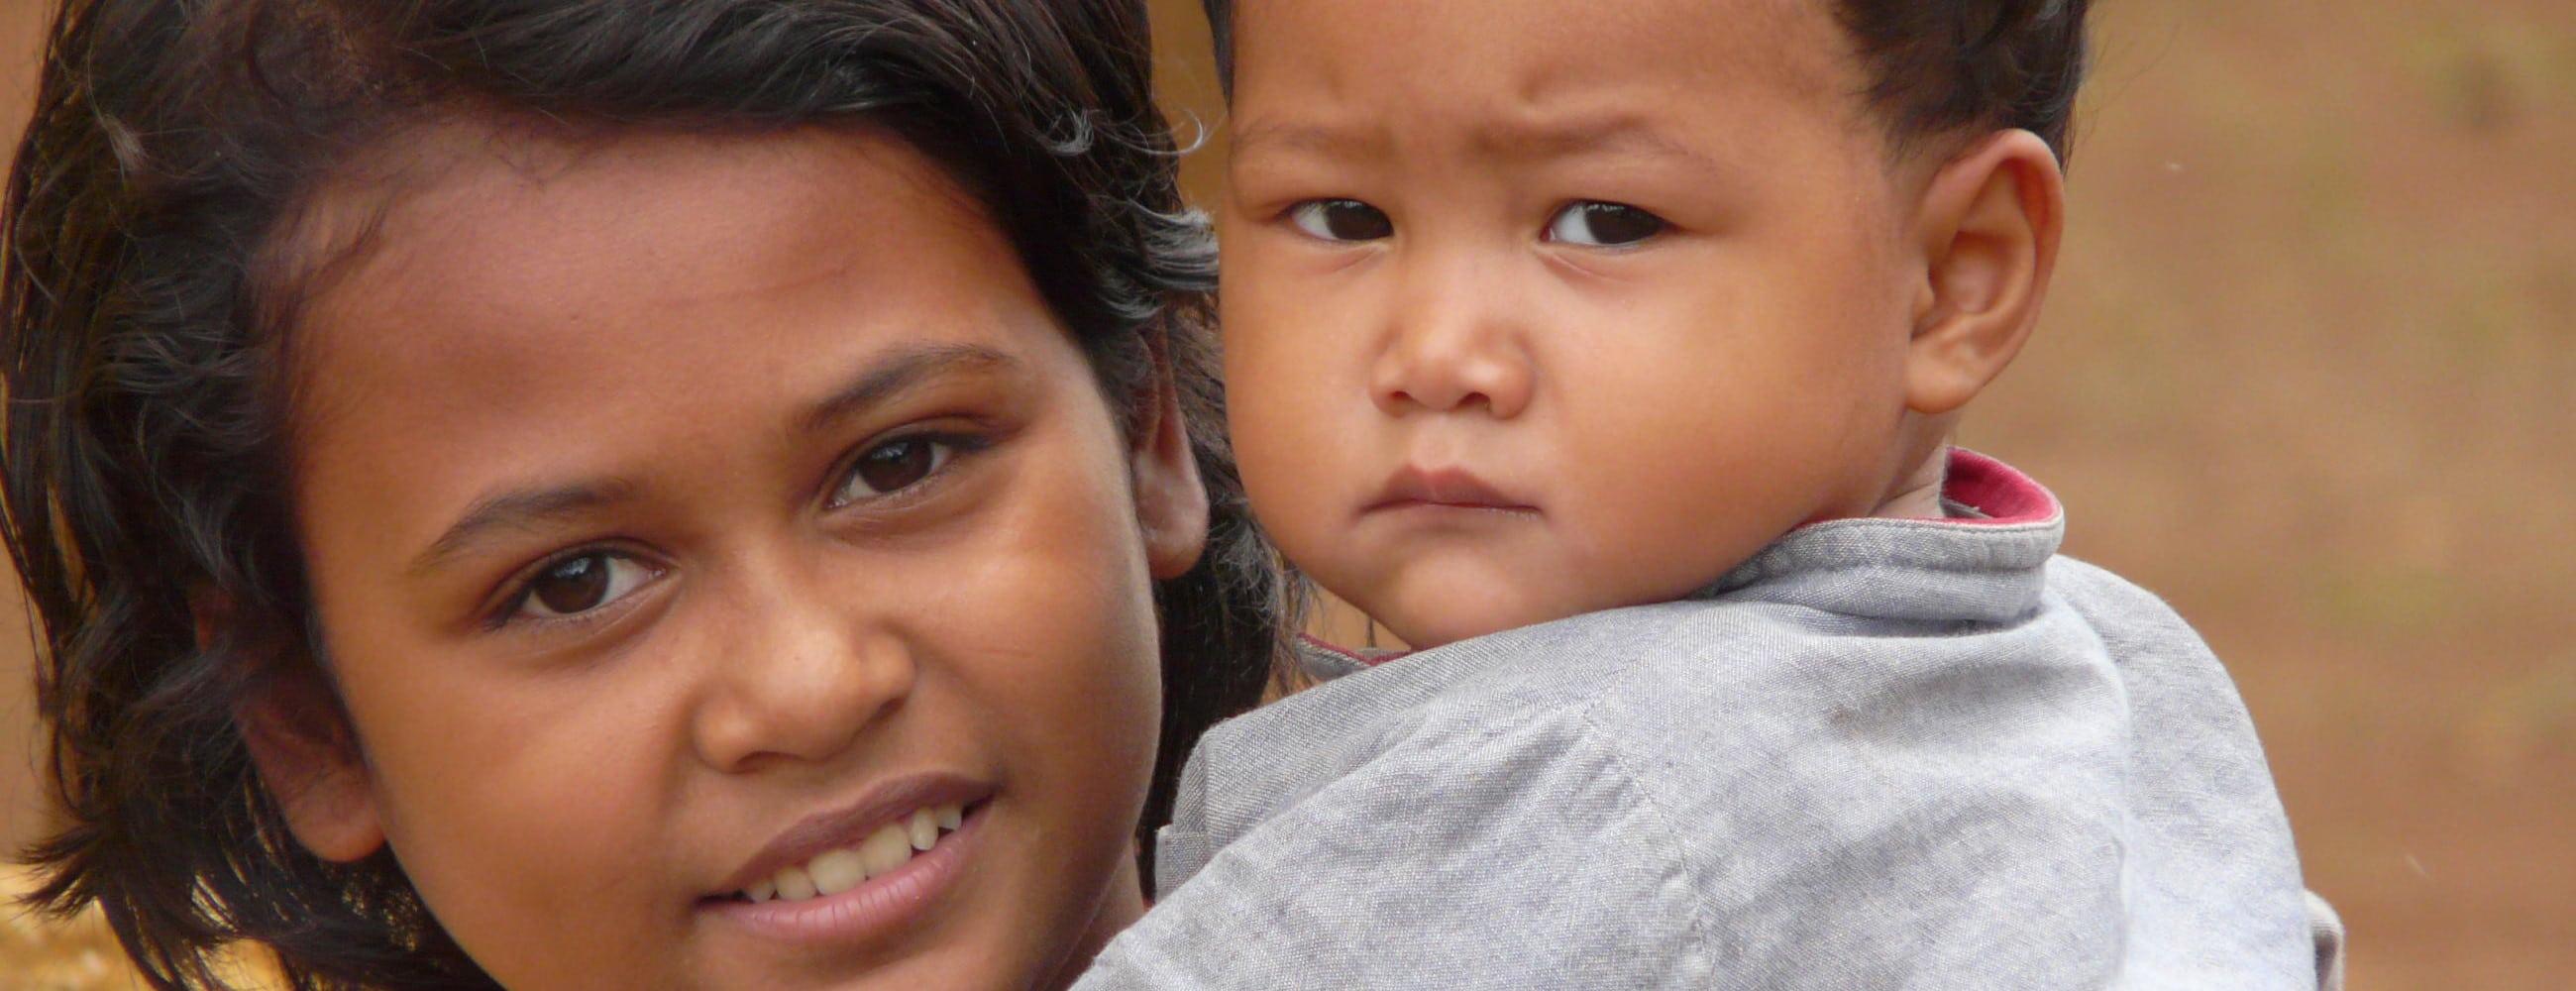 Bunong People of Cambodia